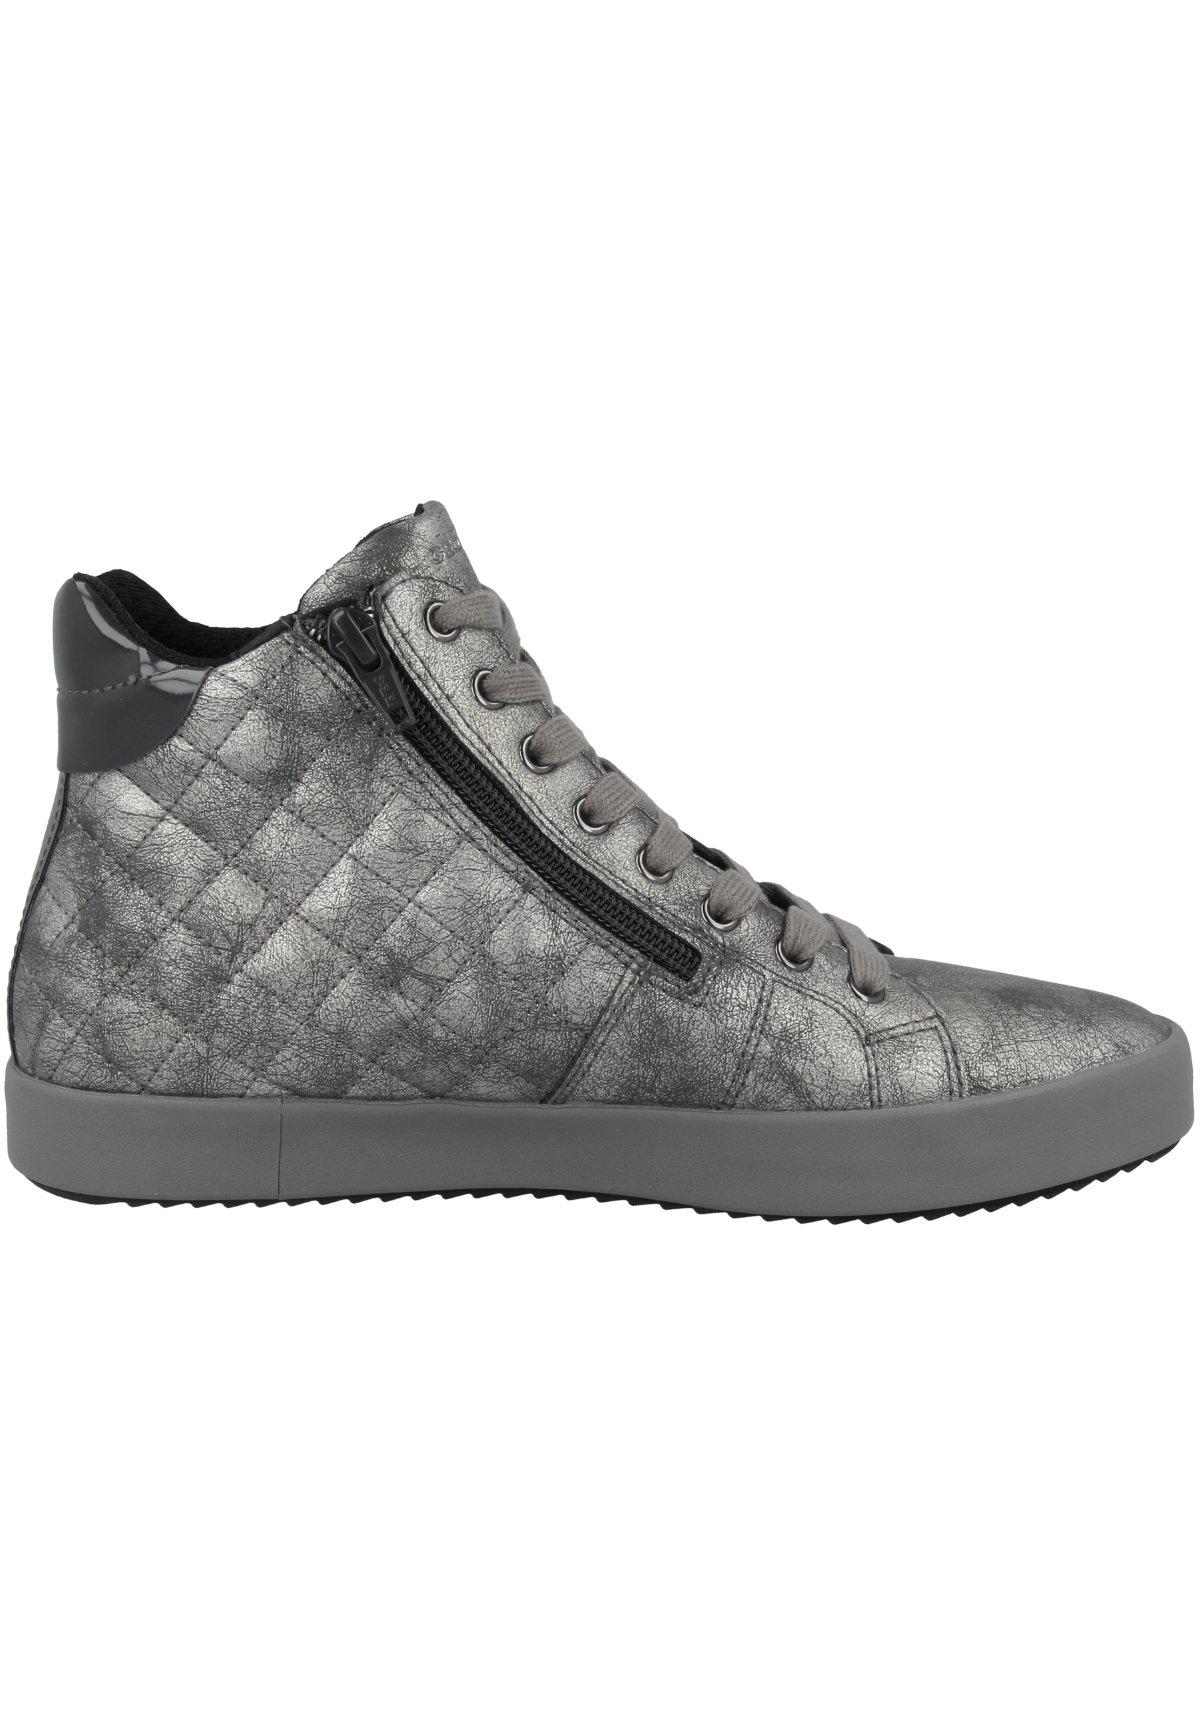 Geox BLOMIEE B Sneaker low gun (d046hb000pvc1357)/gunmetal